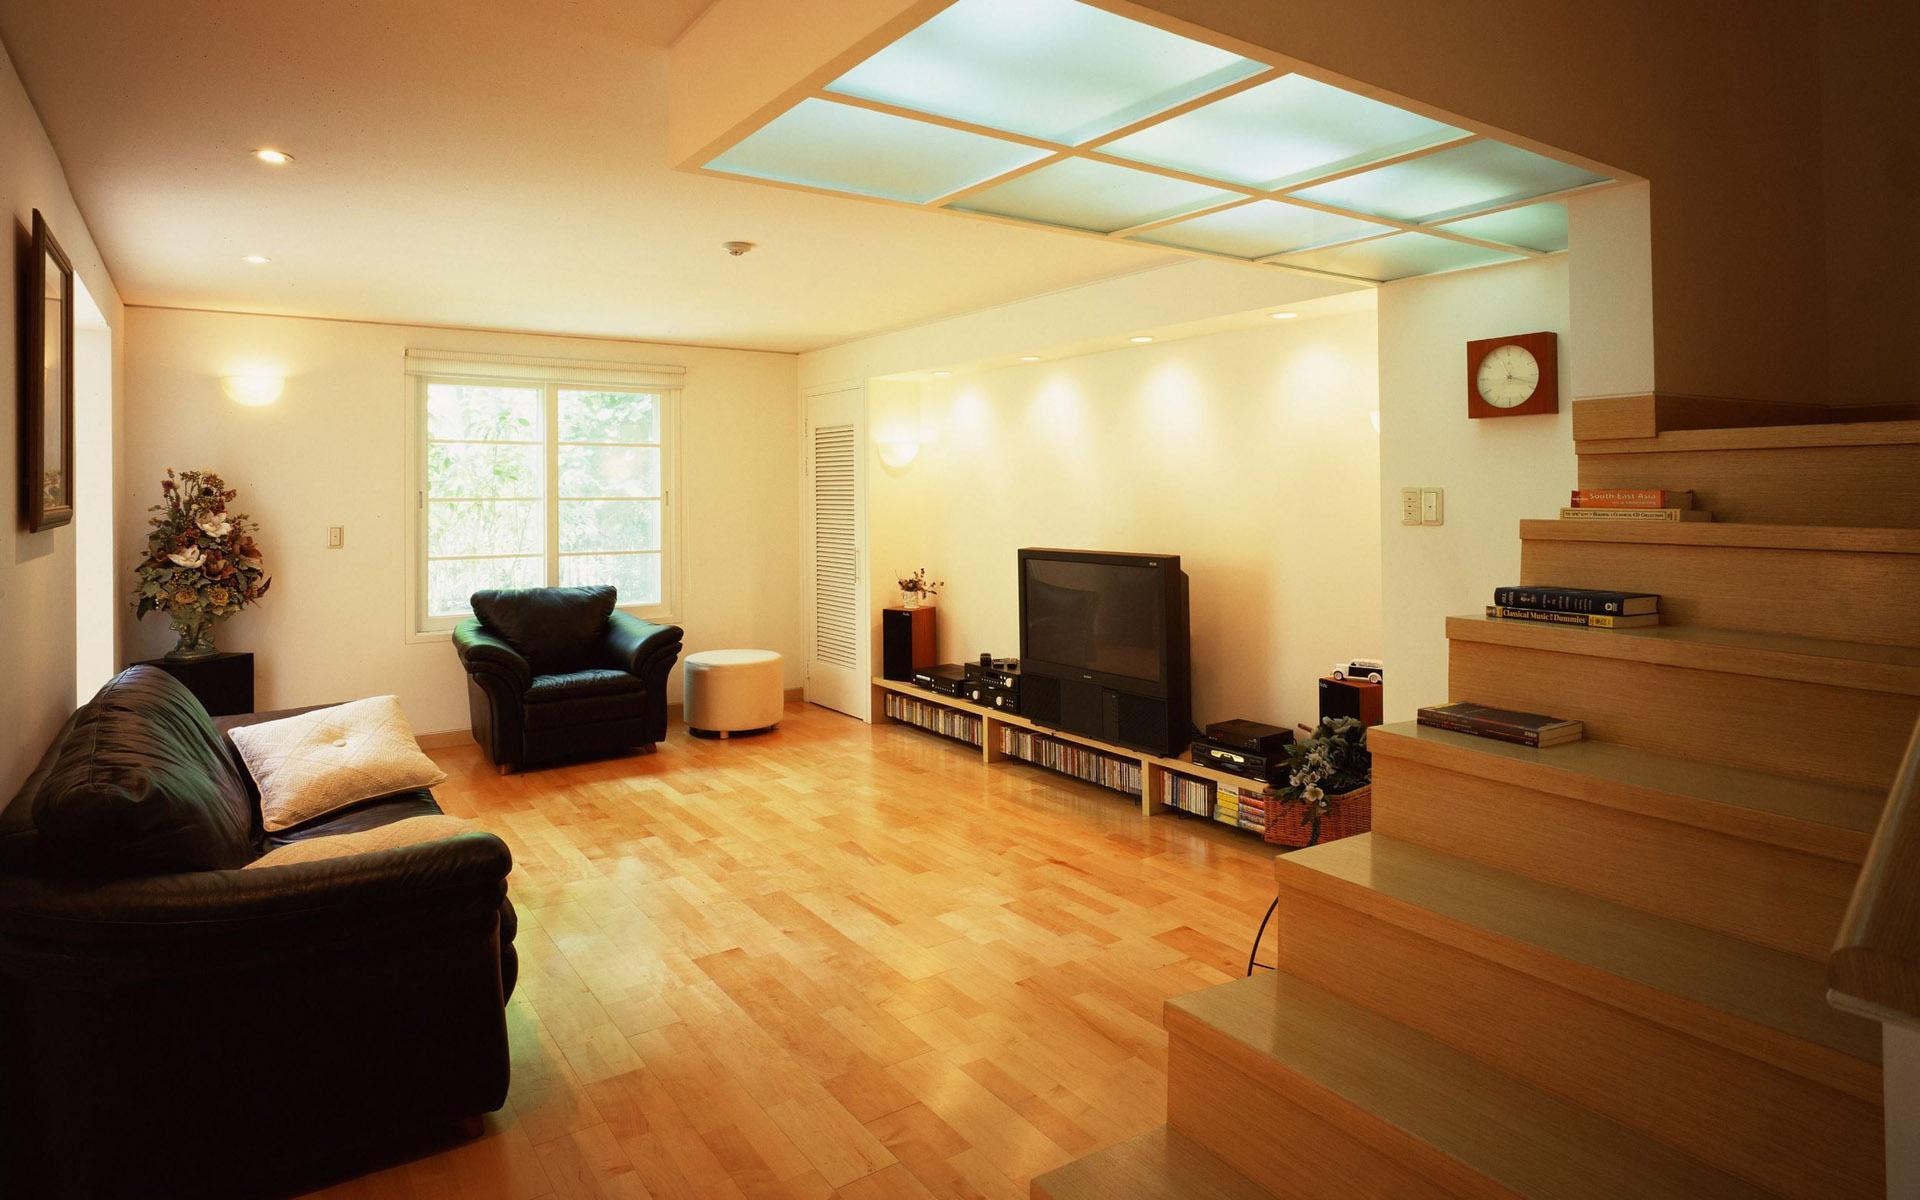 living-room-lighting-ideas living room lighting ideas